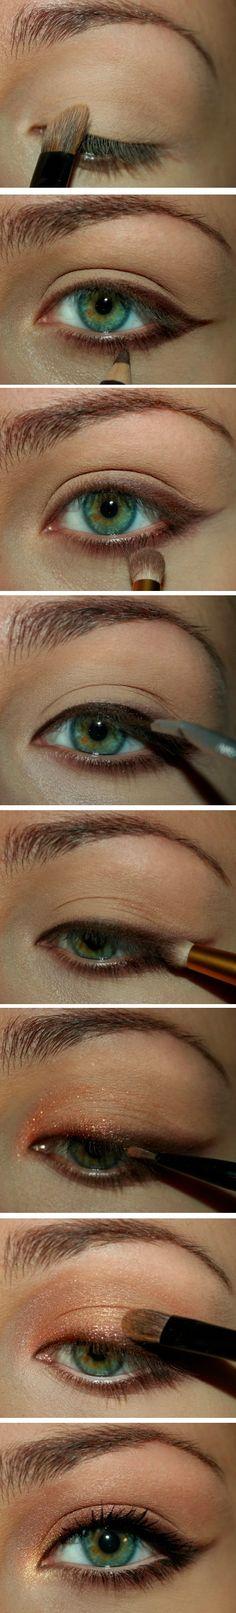 7 Awesome Eye Make-up Tricks.